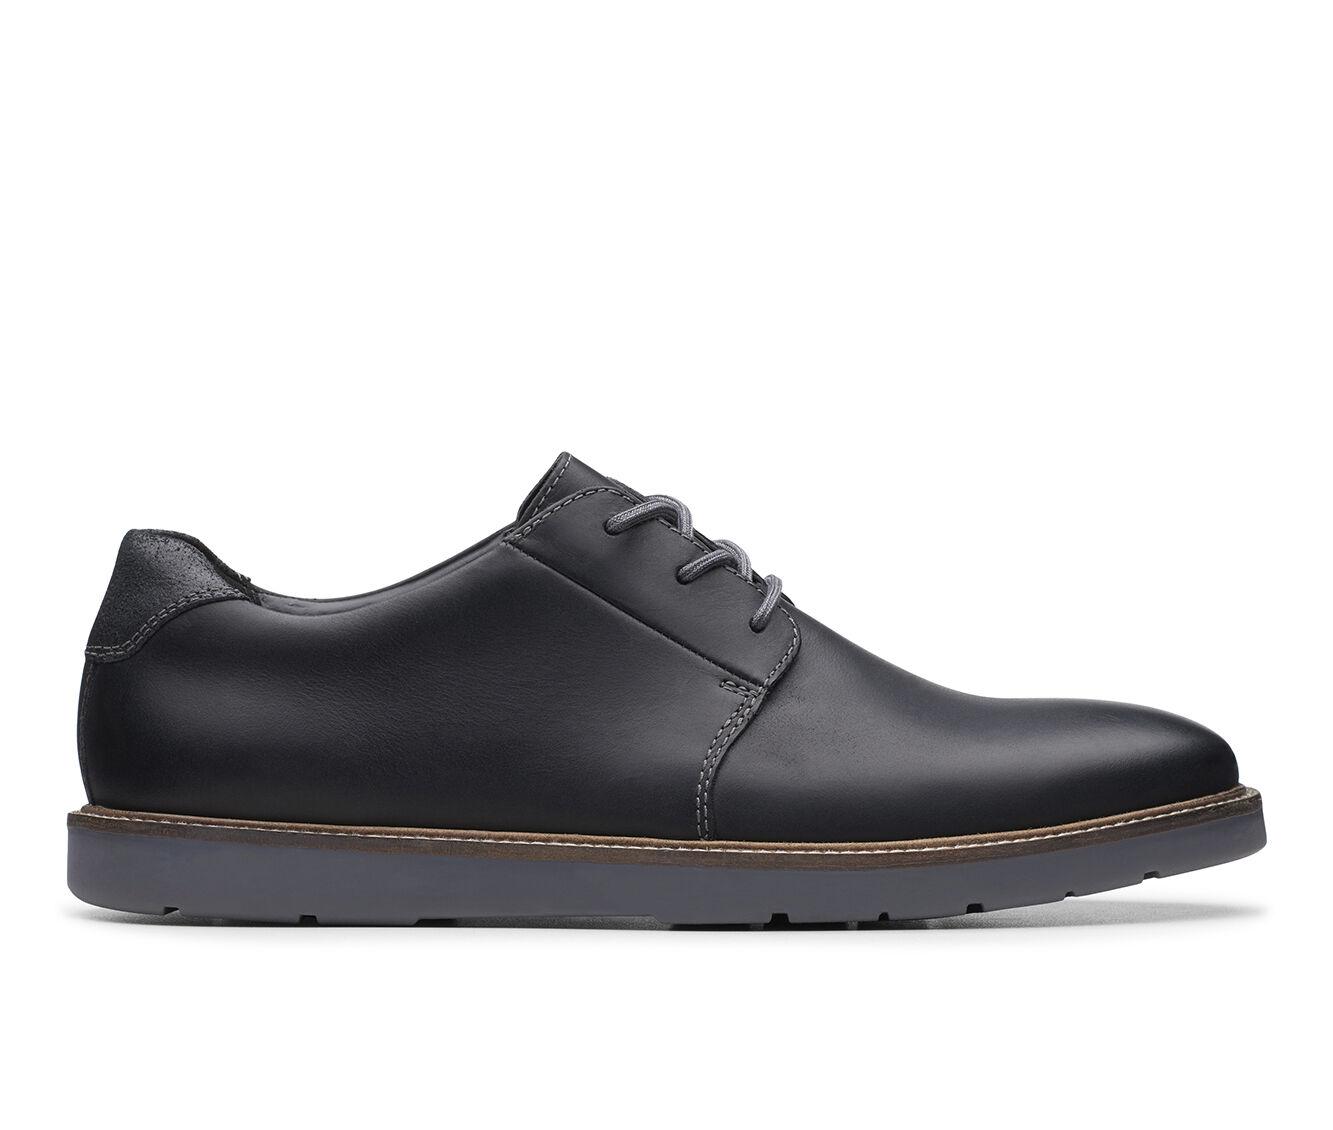 Men's Clarks Grandin Plain Dress Shoes Black